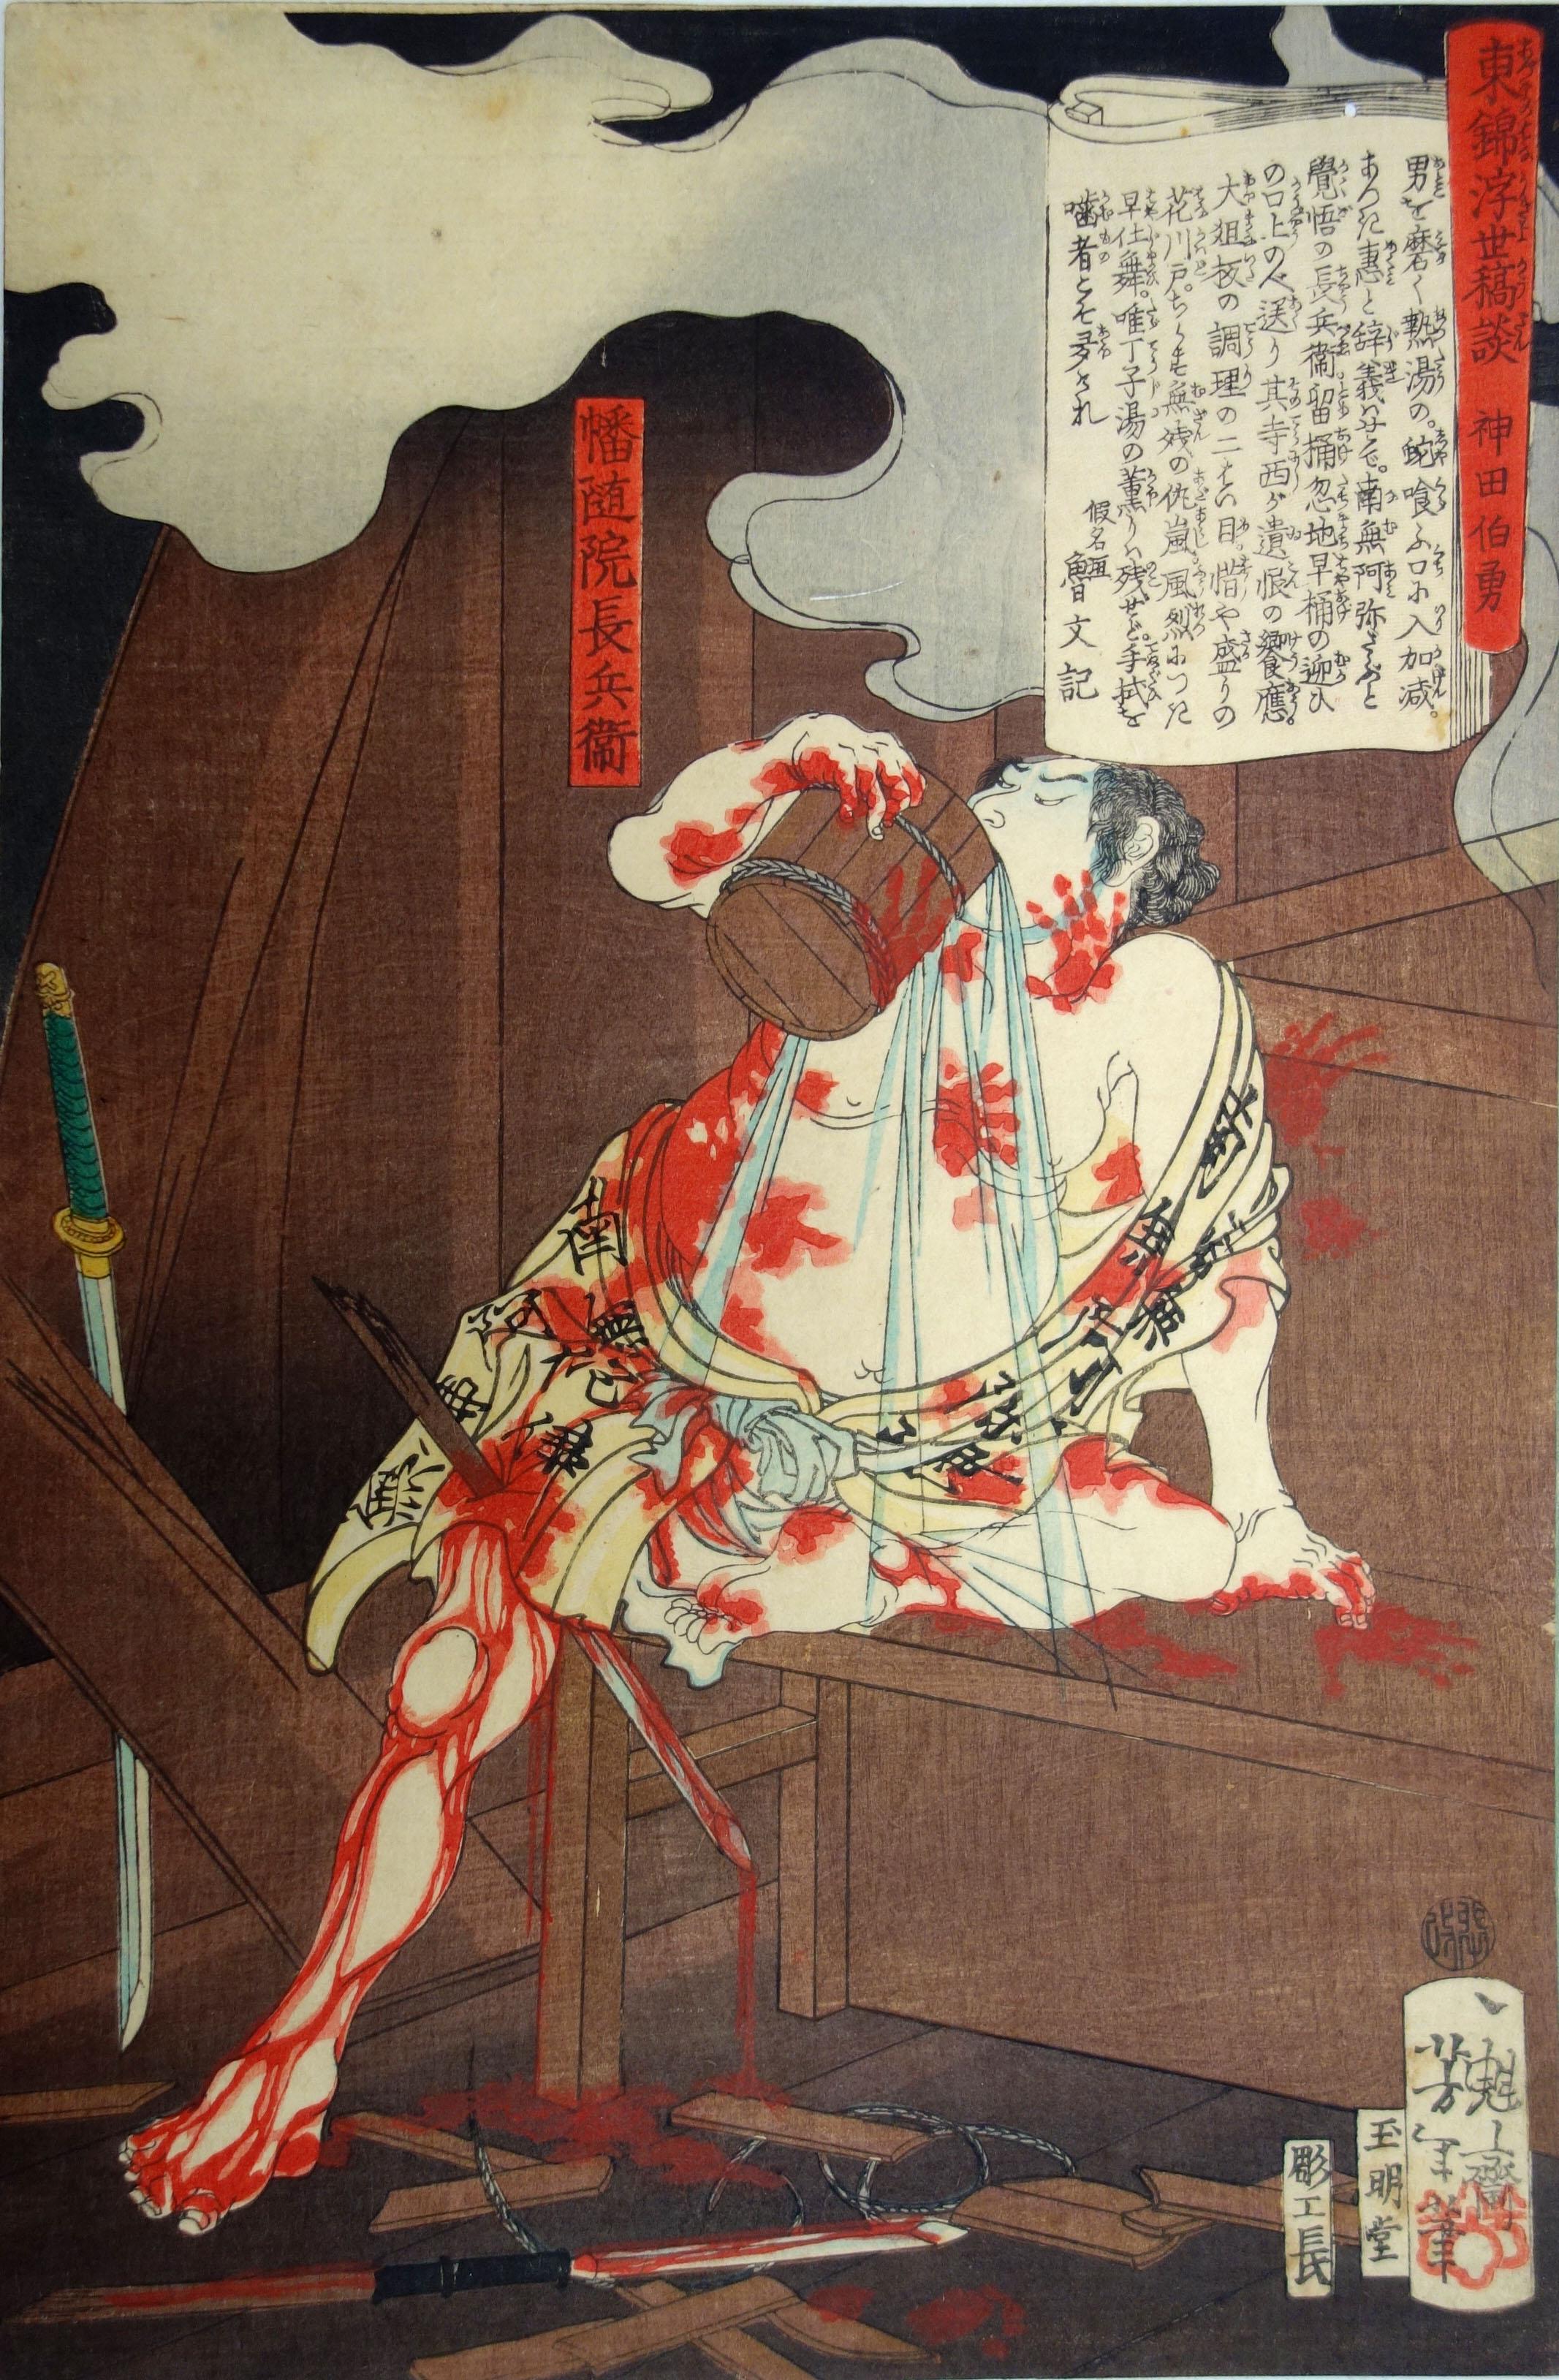 http://www.ukiyoe-ota-muse.jp/wp-content/uploads/exhibition/2015_edonoaku/03.jpg